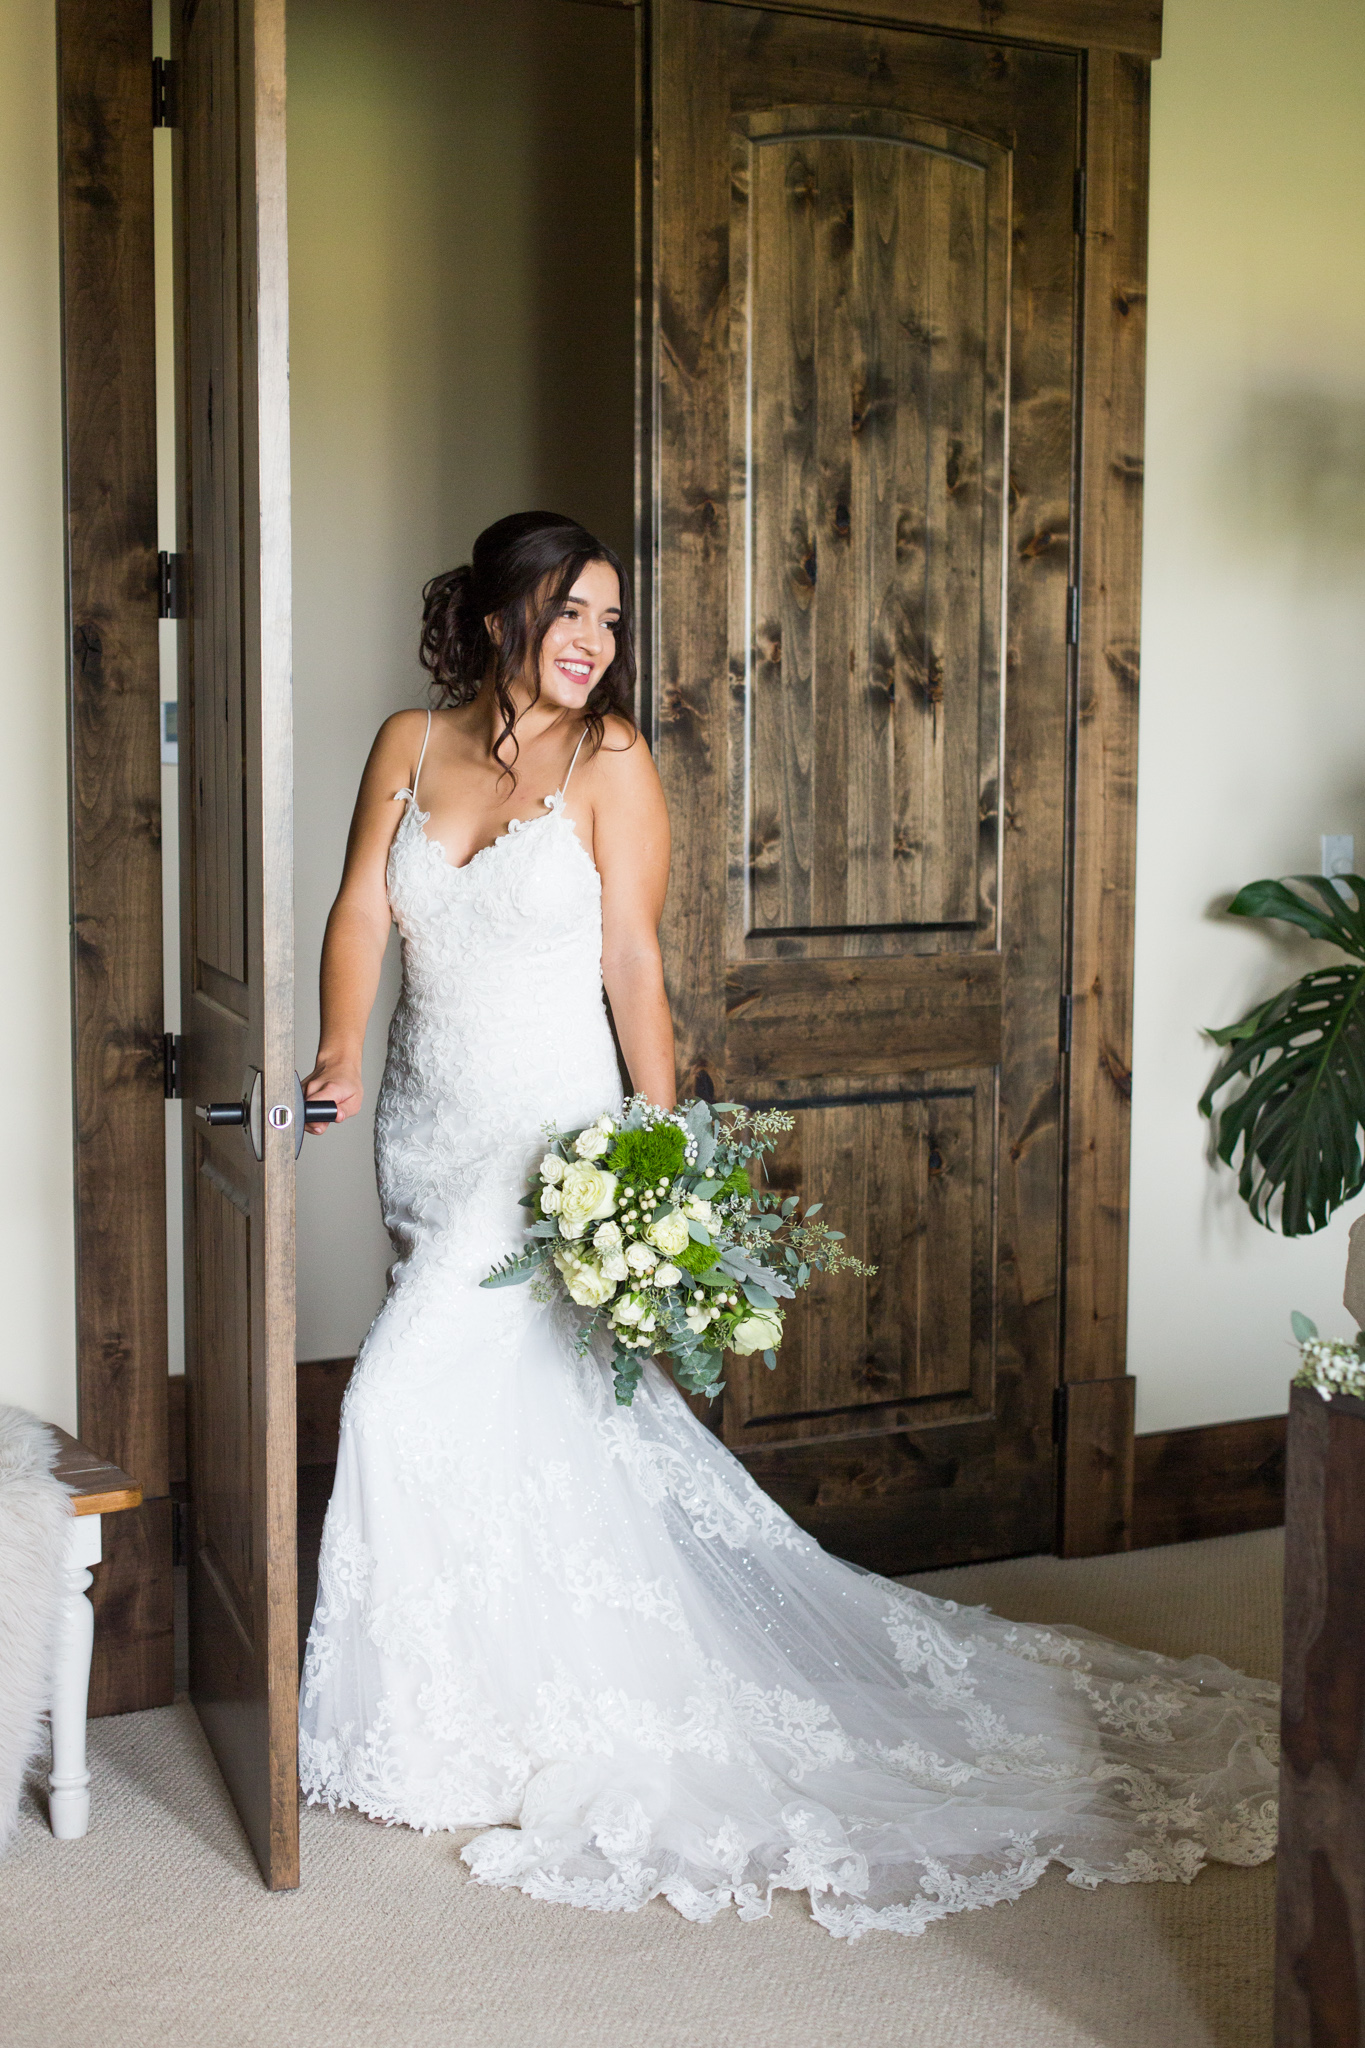 Olga_janni_wedding_090917_WEBSIZE (118 of 704).JPG